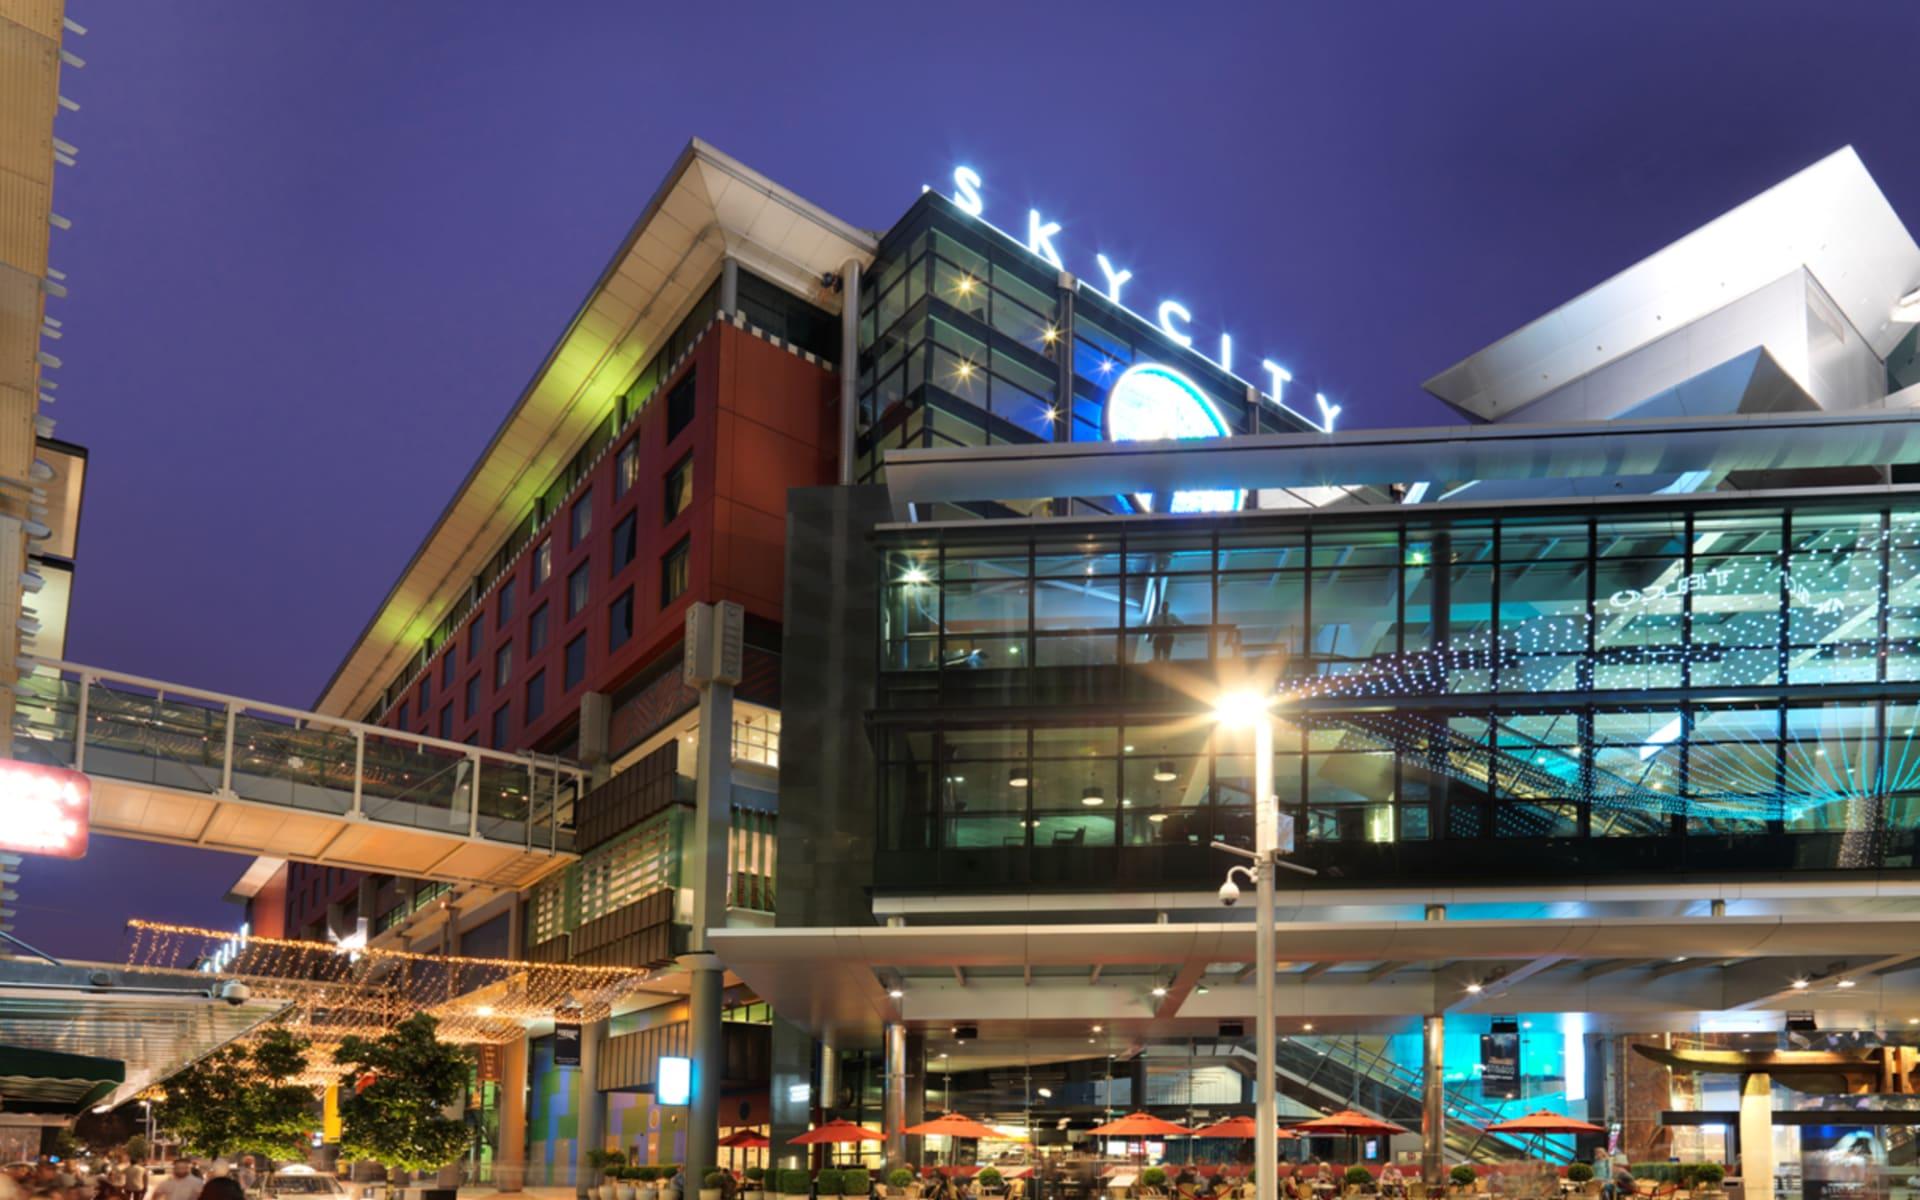 Skycity Hotel Auckland:  SKYCITY external medium res